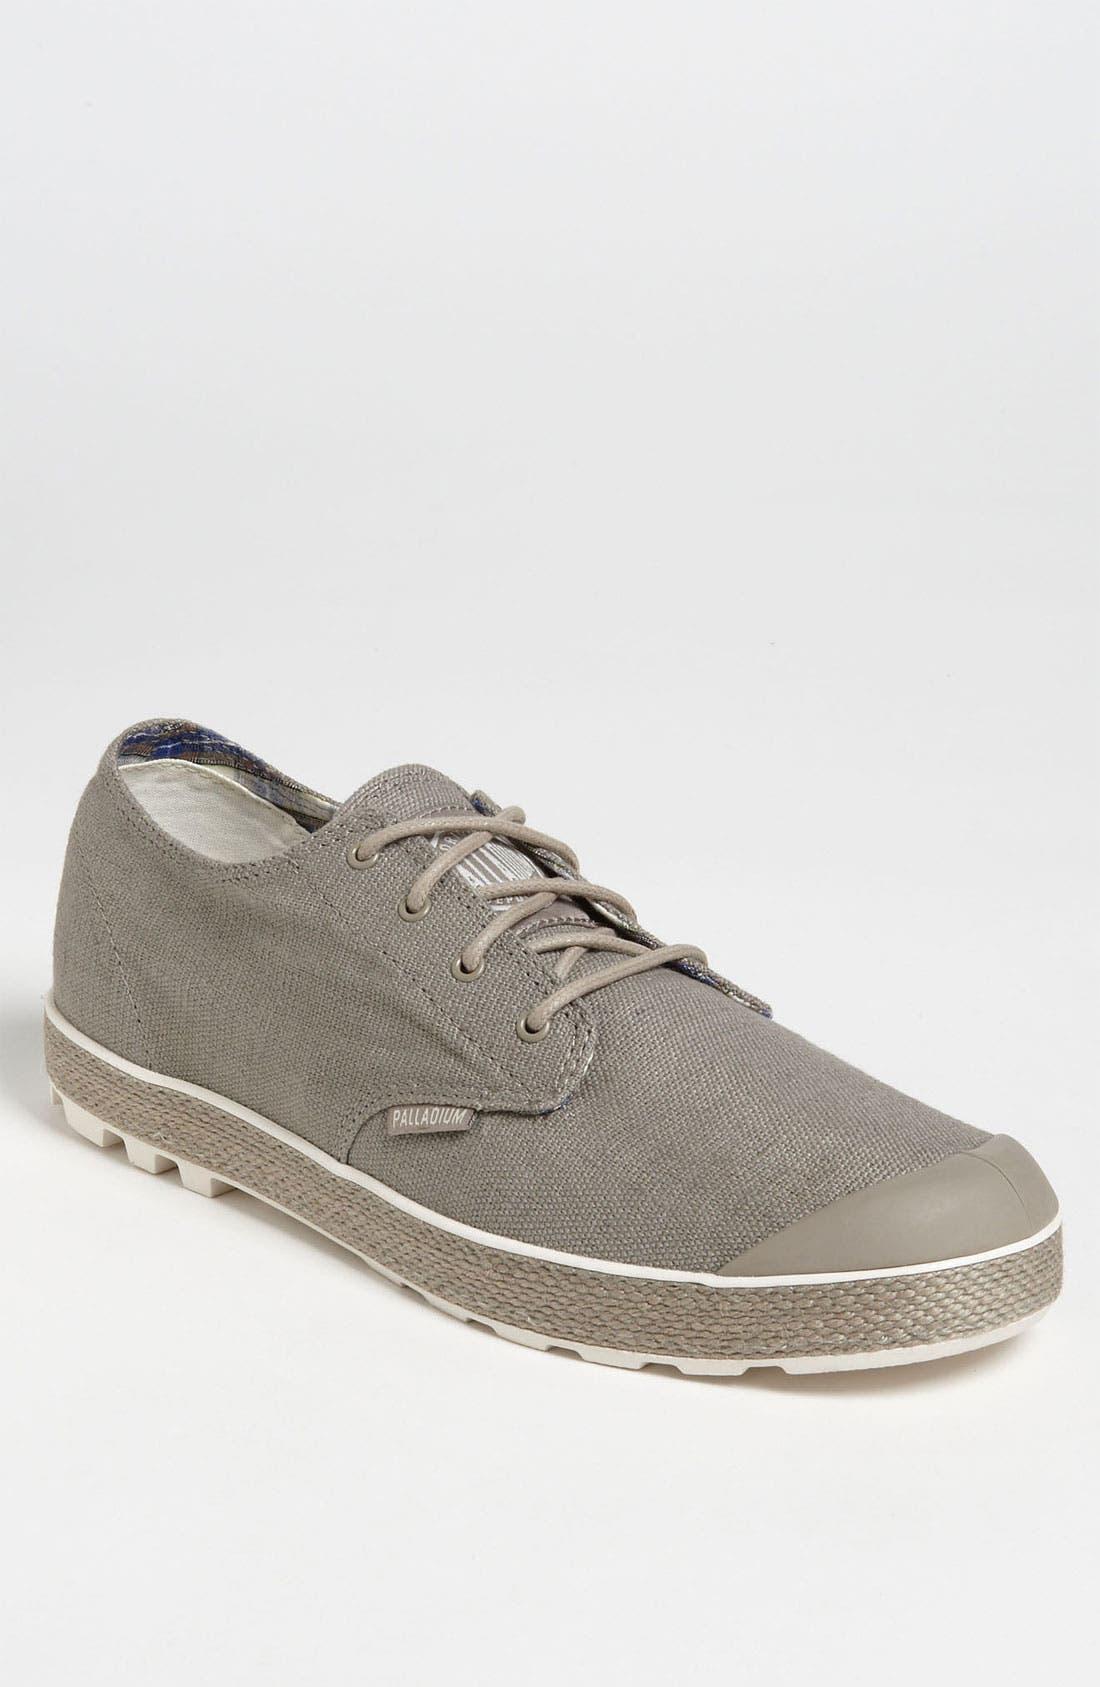 Alternate Image 1 Selected - Palladium Hemp Blend Sneaker